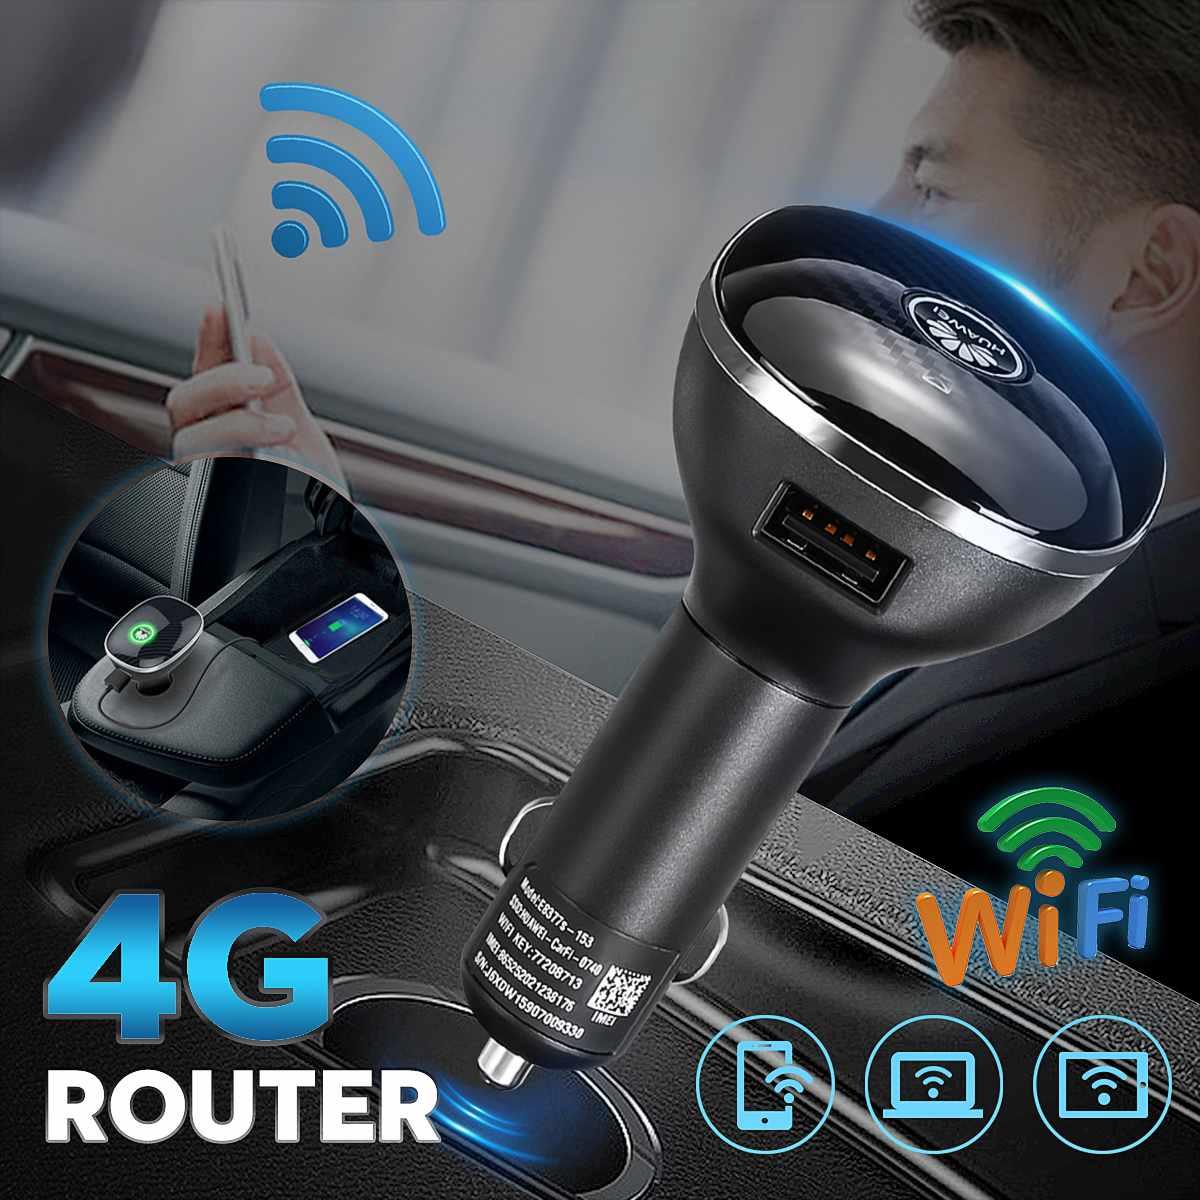 Unlocked-4g lte CPE автомобиля wifi маршрутизатор CarFi E8377 fdd все диапазоны LTE точка доступа ключ 4 г LTE Cat5 автомобильный Wifi модем pk e5172 b593